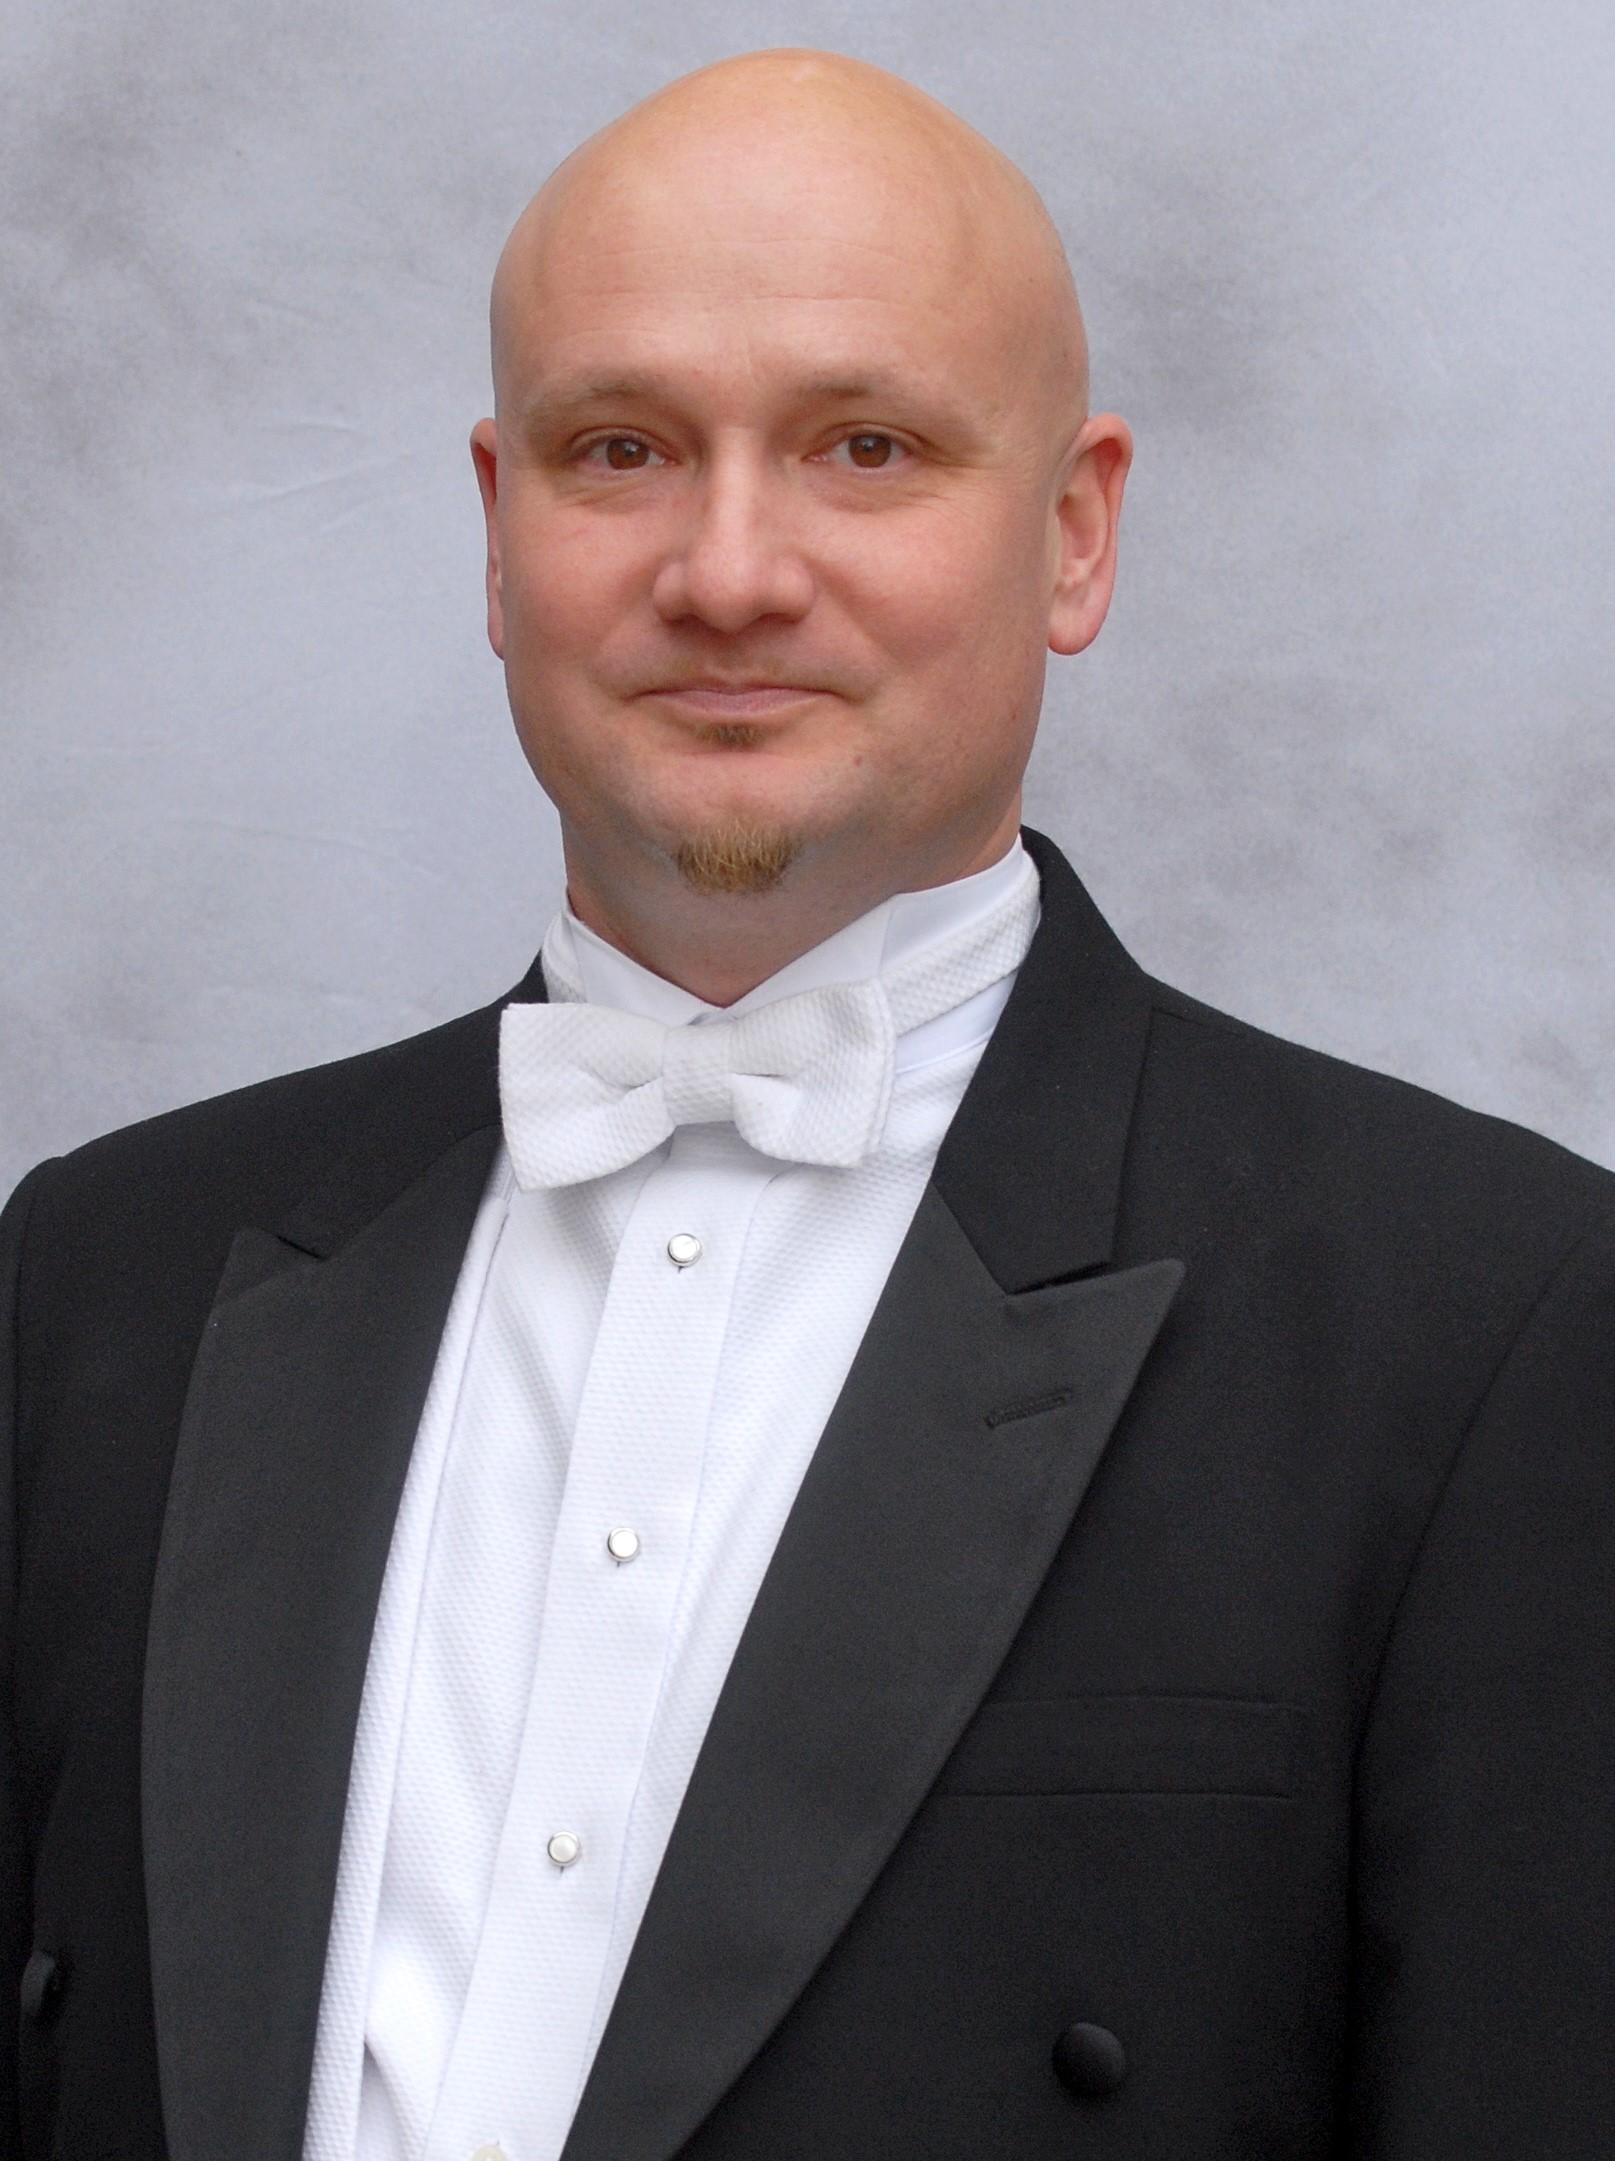 Dr. Andrew Yozviak